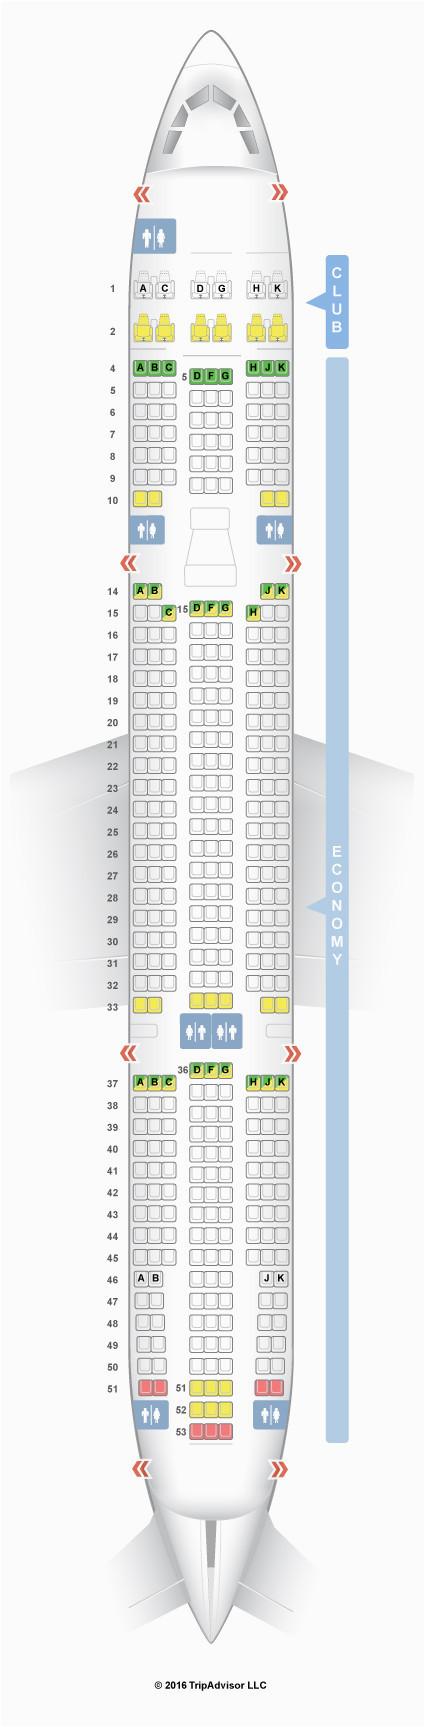 air canada seating chart elegant seatguru seat map air transat